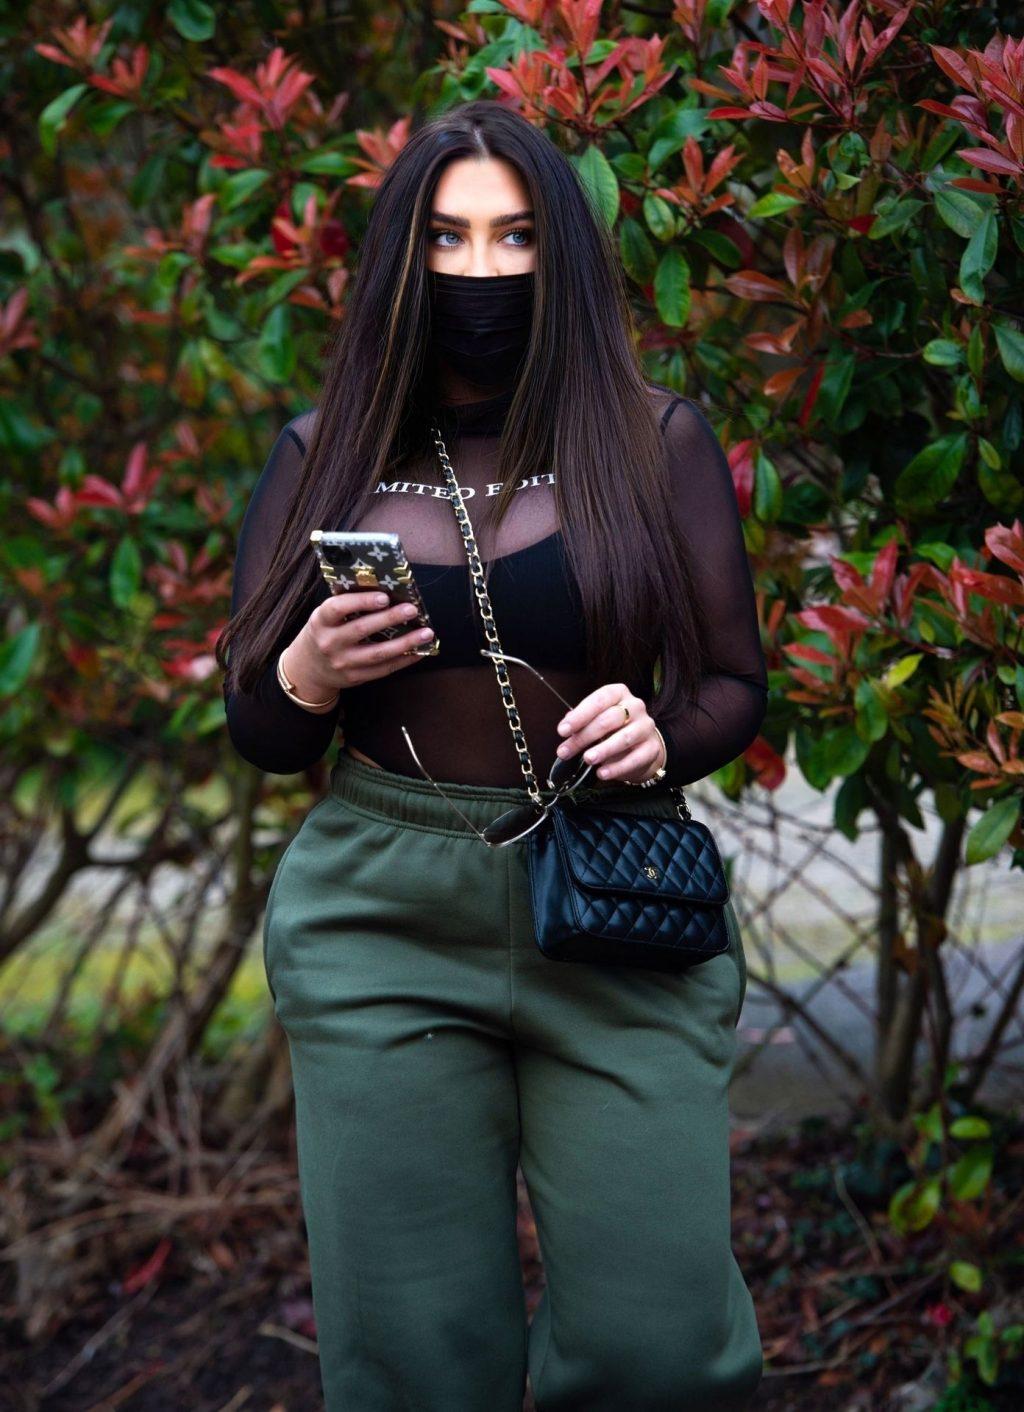 Lauren Goodger Wears a Facial Mask to Protect Against Coronavirus (15 Photos)